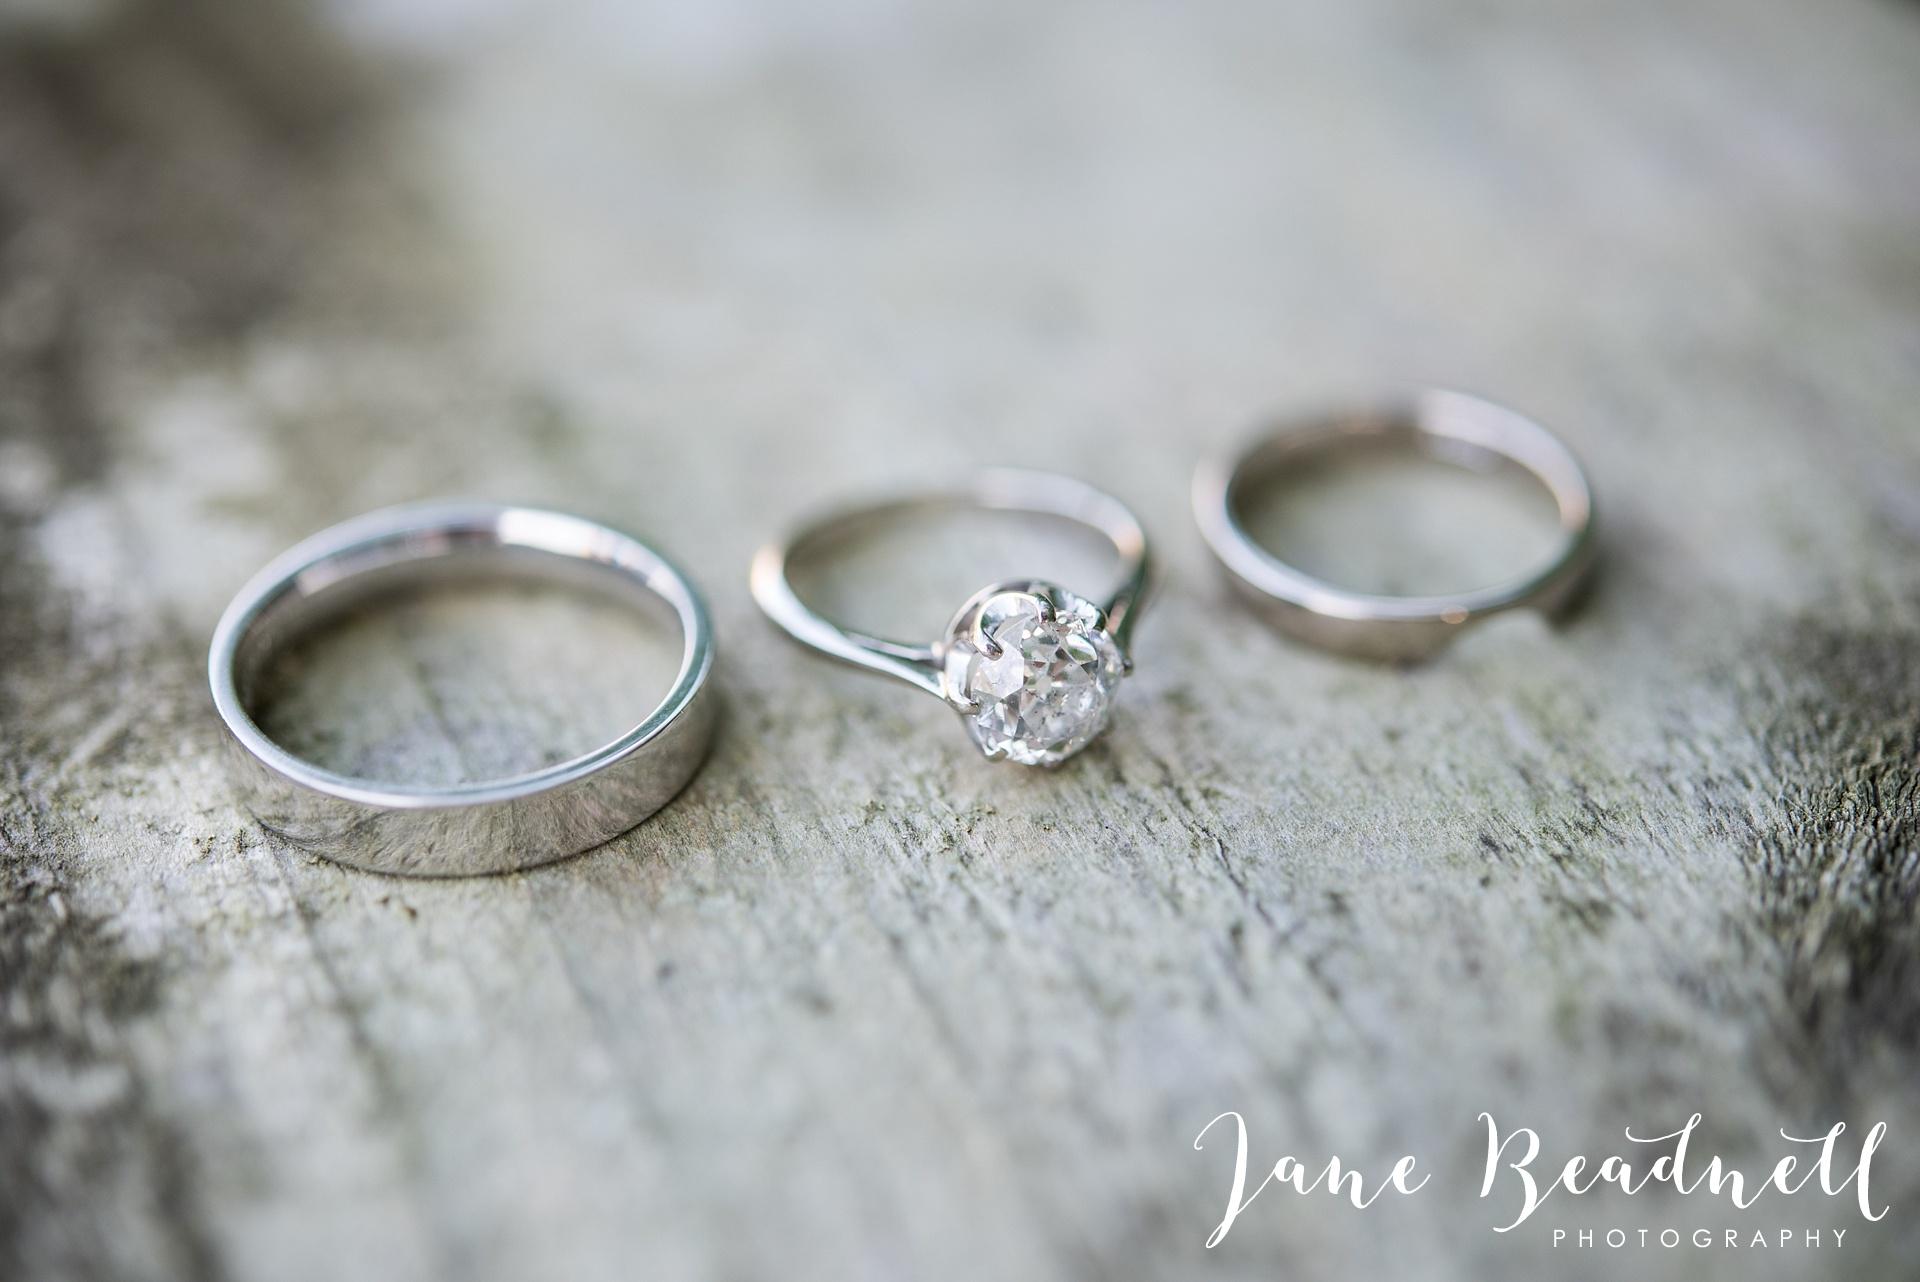 fine-art-wedding-photographer-jane-beadnell-yorkshire-wedding-photographer_0103